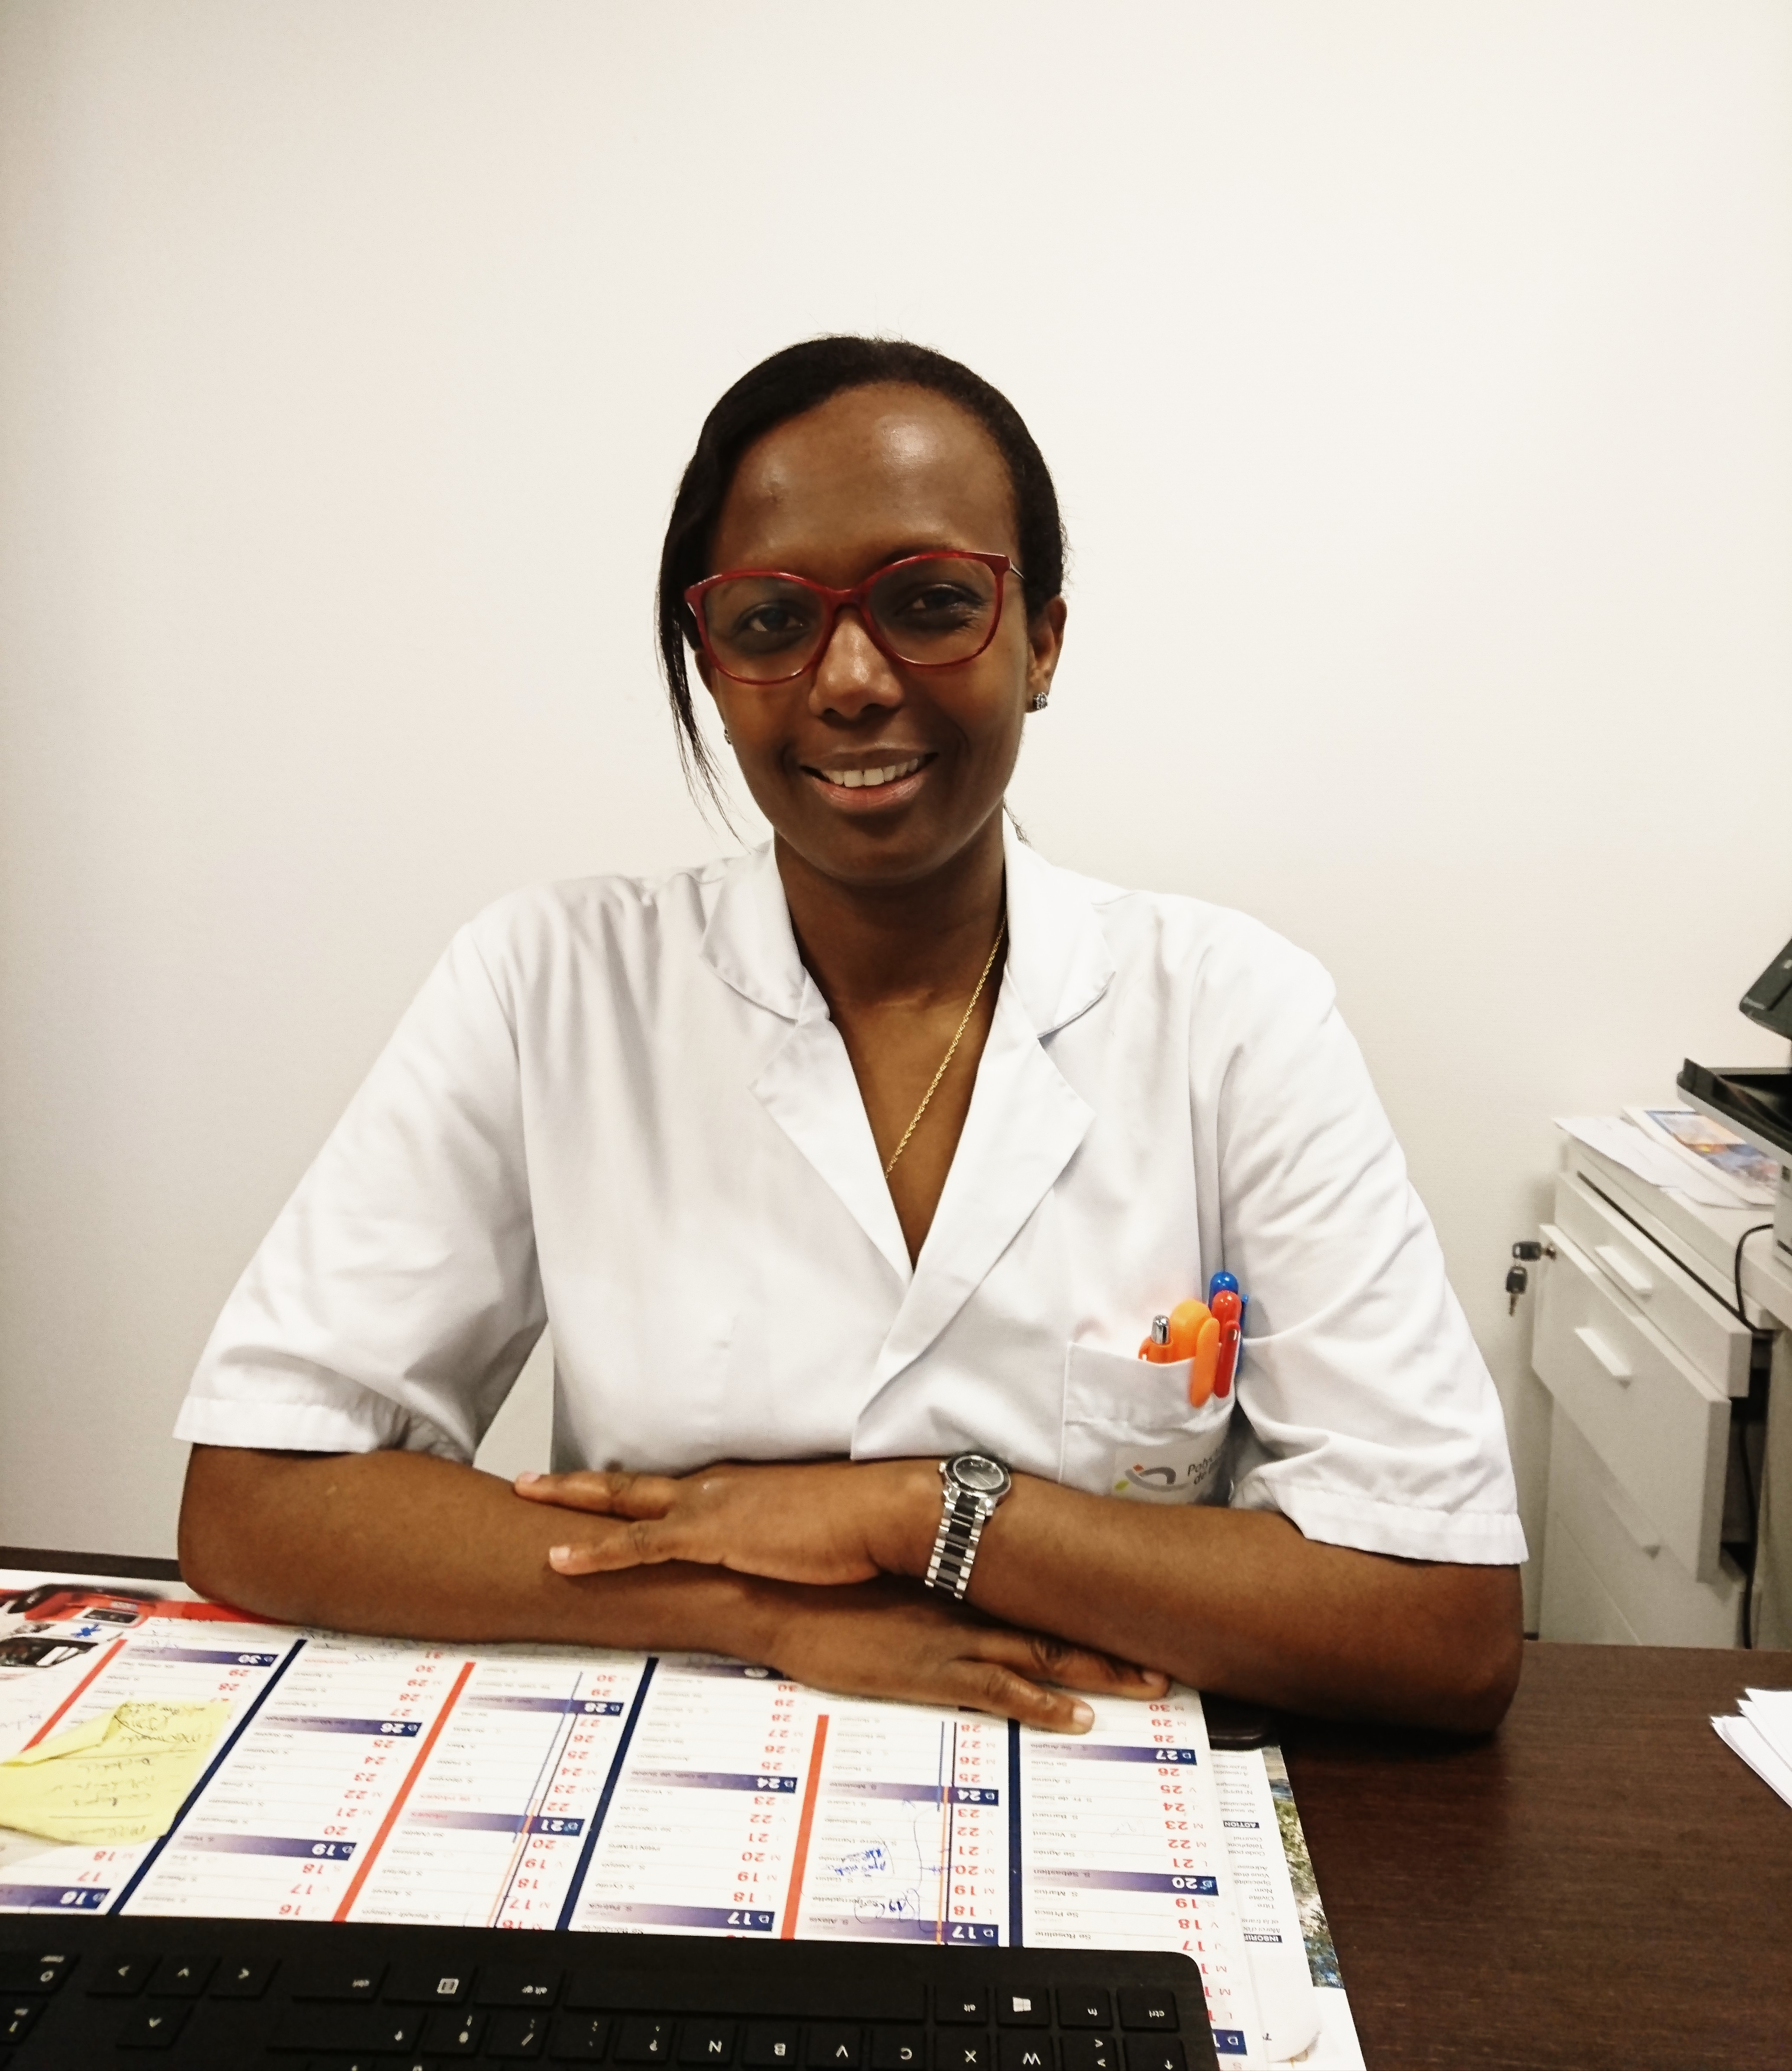 Dr Munega